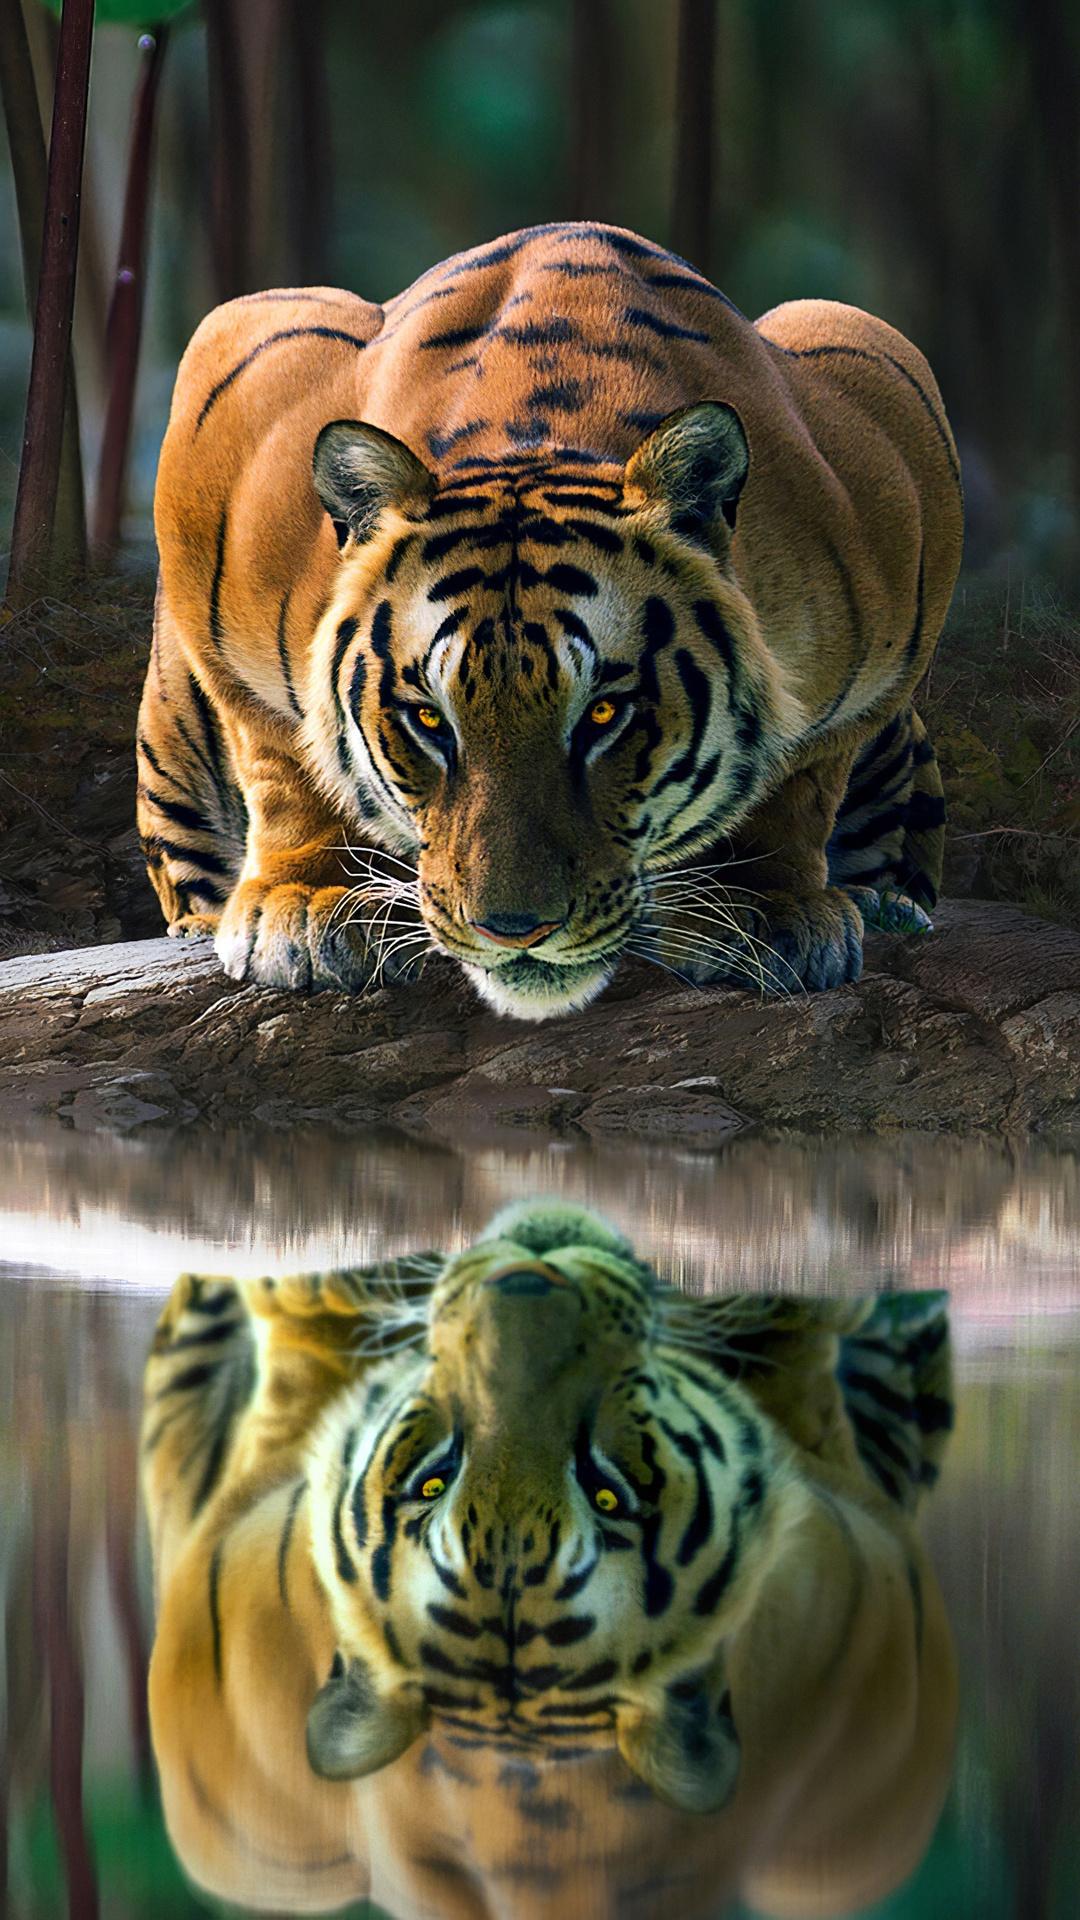 tiger-glowing-eyes-drinking-water-4k-hf.jpg